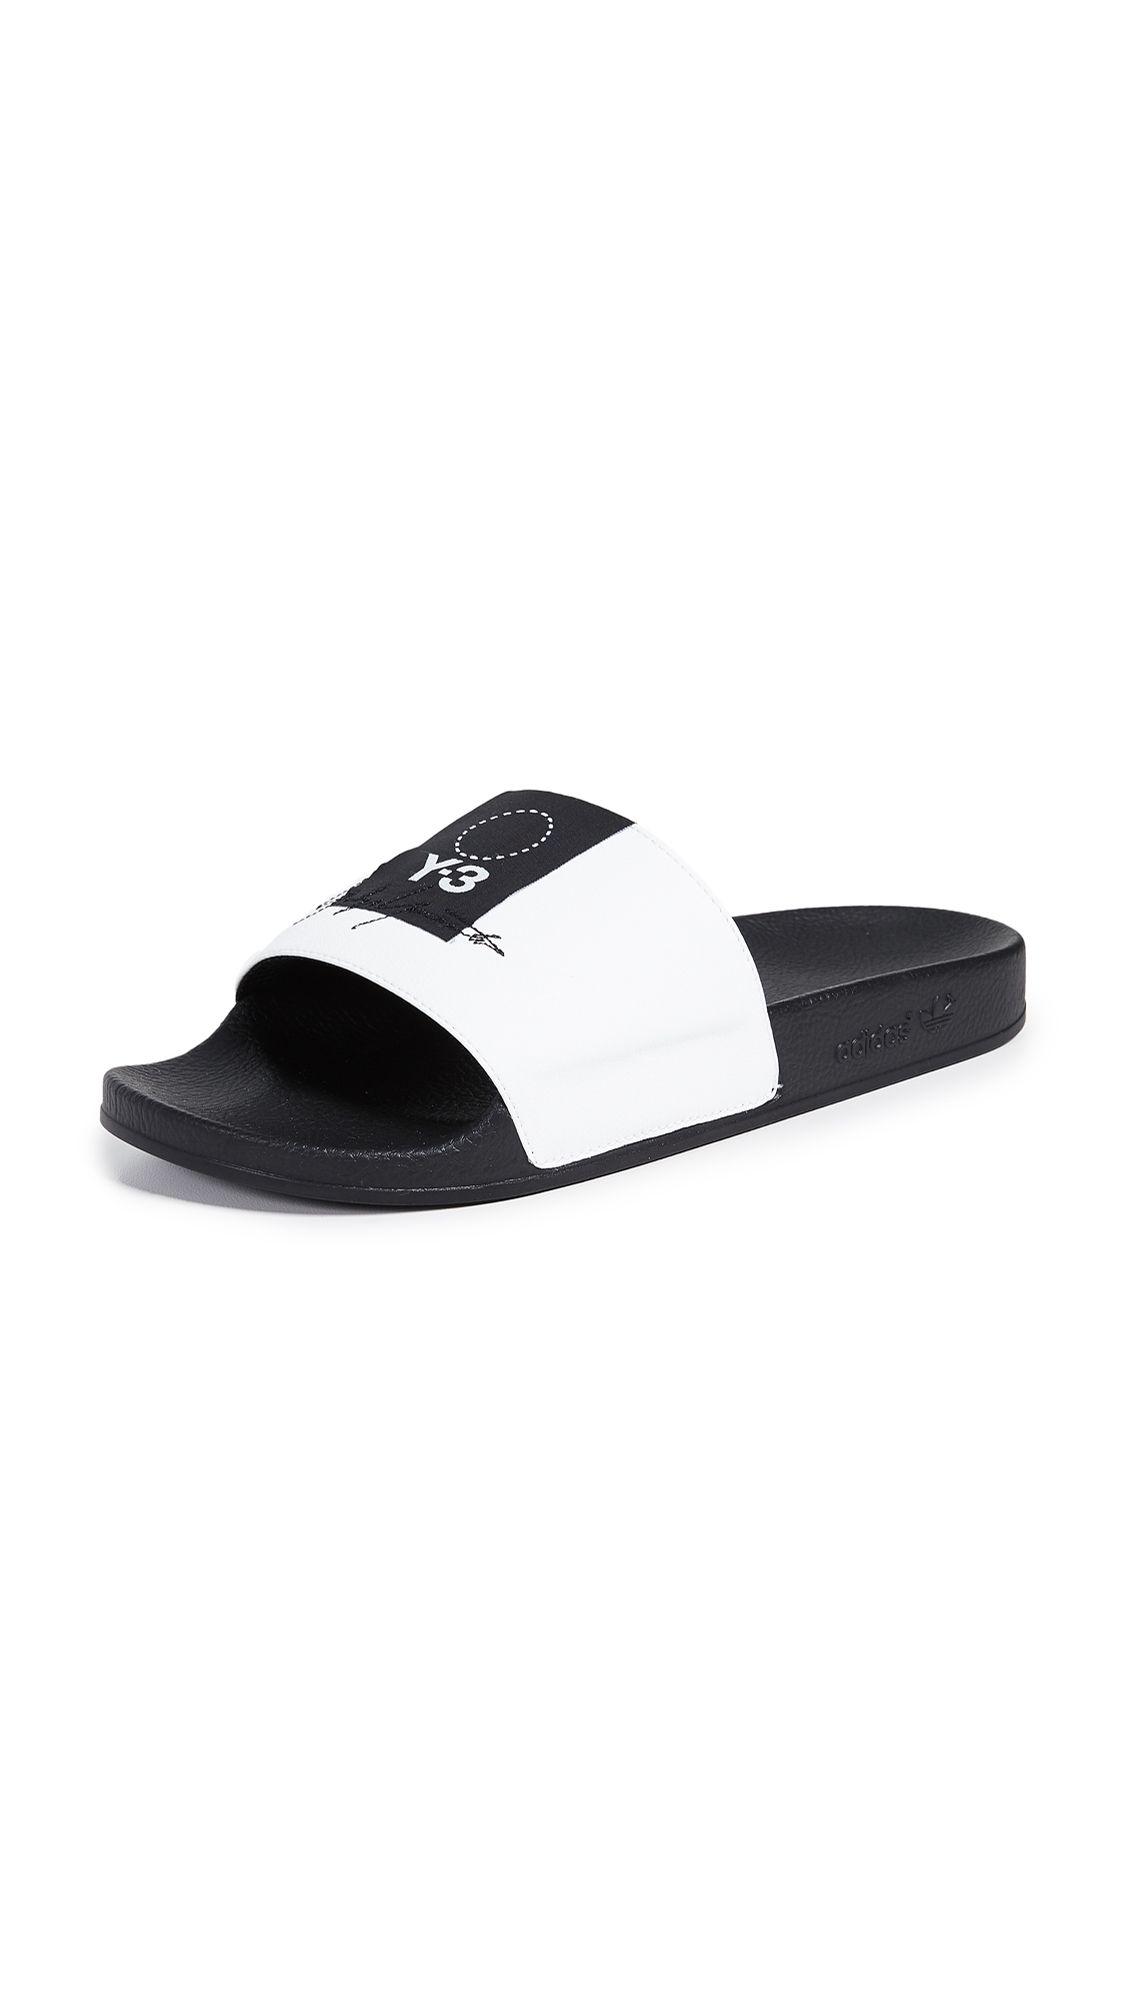 f6b2ae08f9b8 Y-3 ADILETTE SLIDES.  y-3  shoes